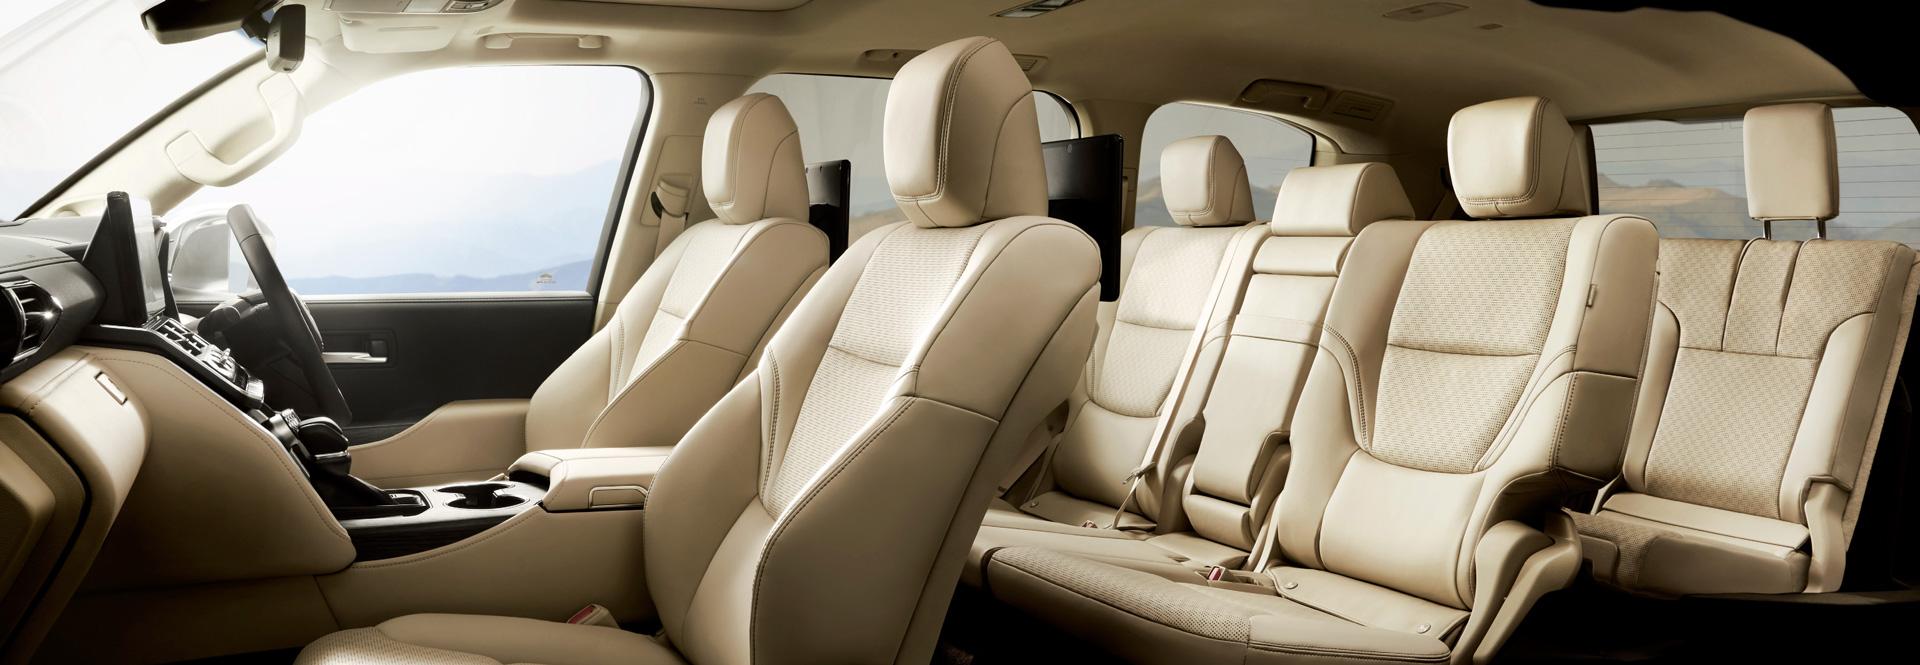 Toyota Launches New Land Cruiser - Image 1